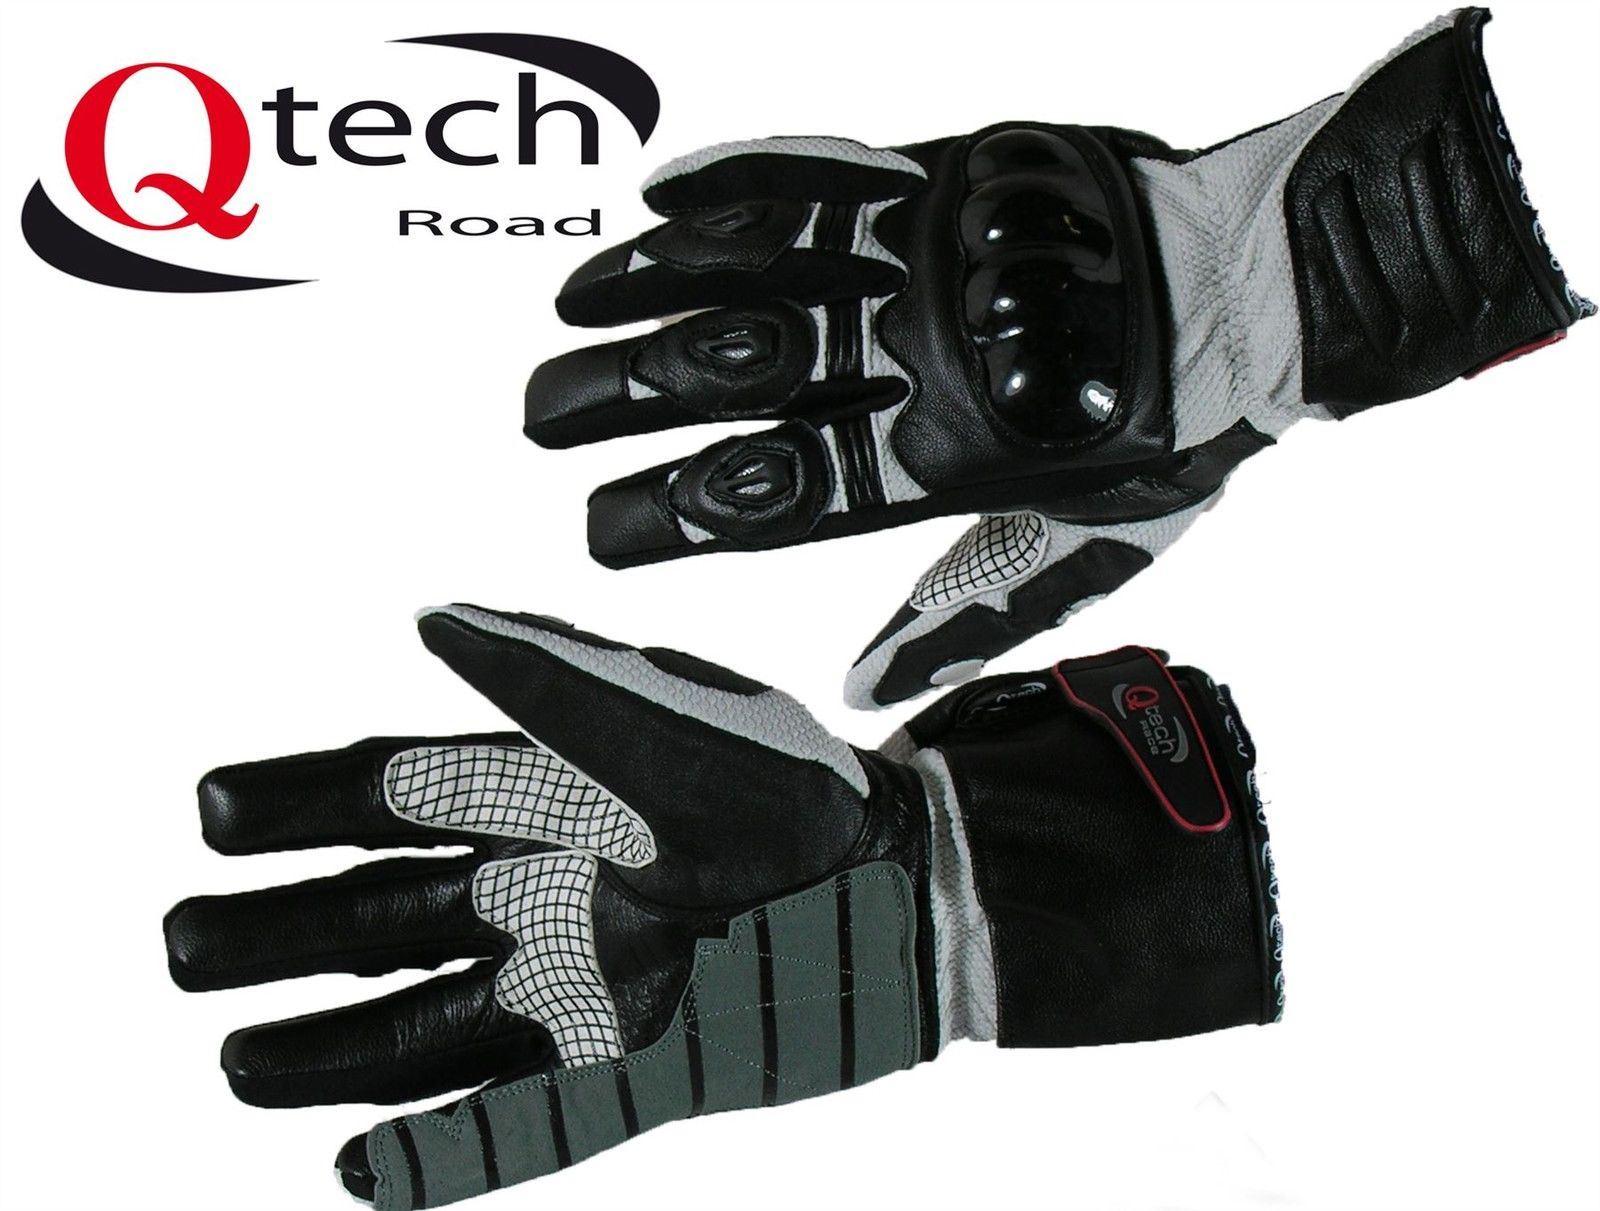 gants de moto renforc s en cuir et tissu randonn e ebay. Black Bedroom Furniture Sets. Home Design Ideas